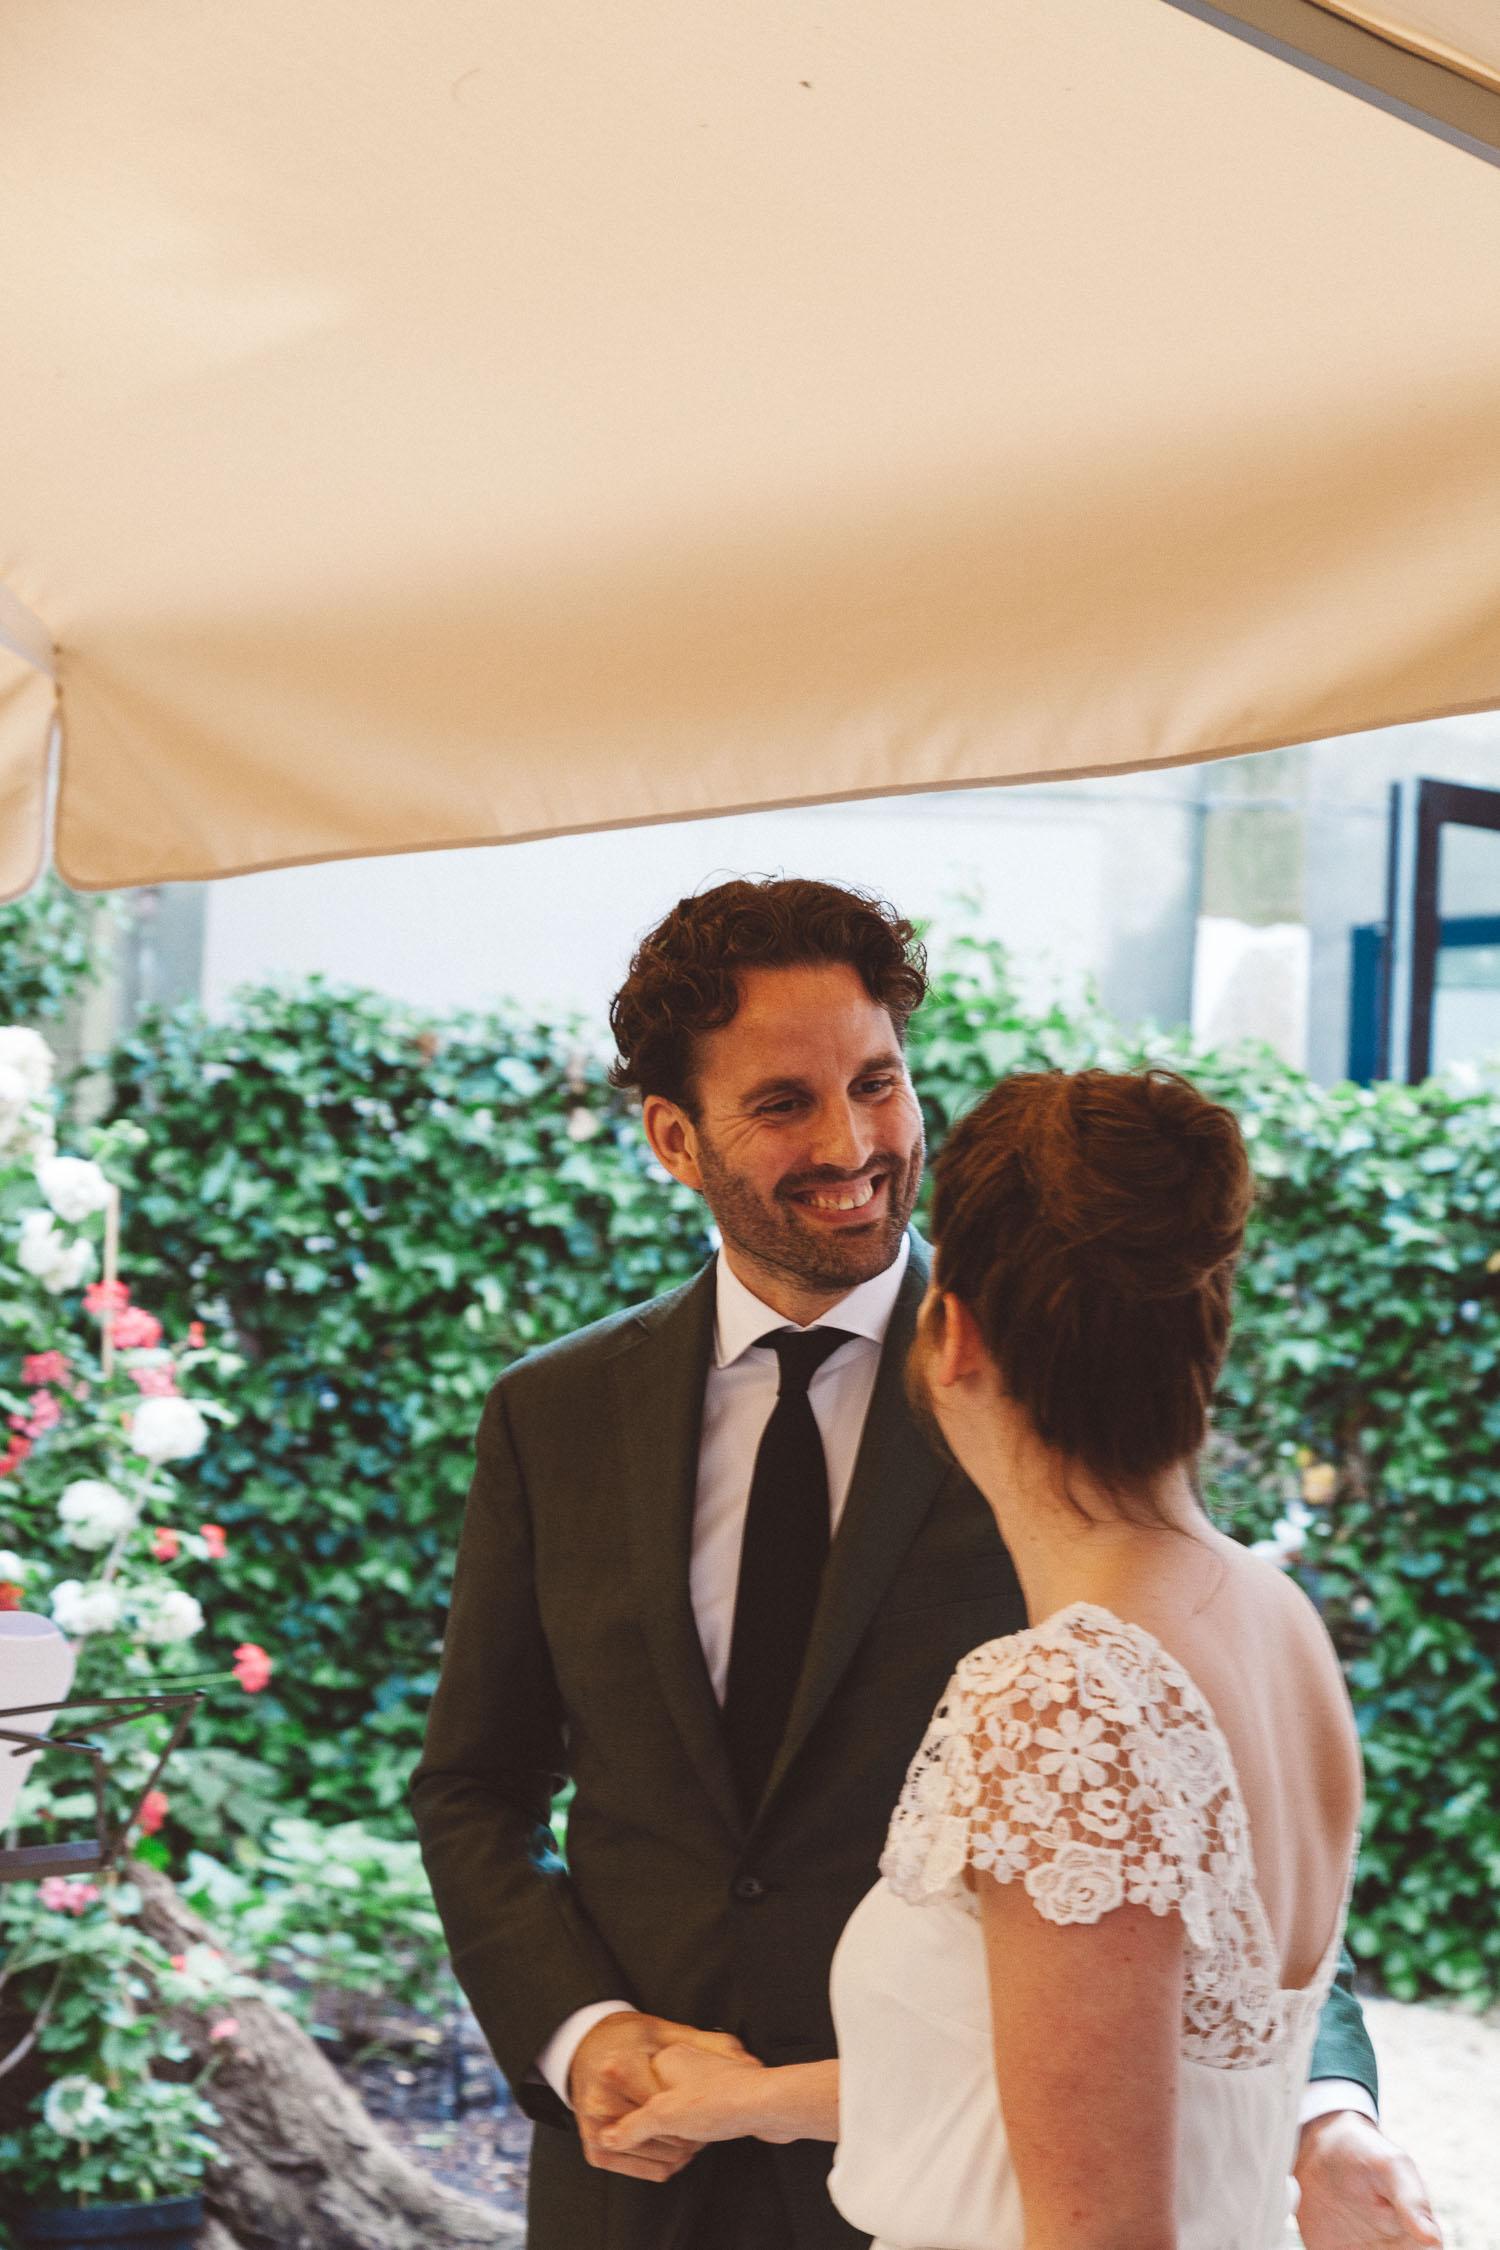 Backyard-wedding-Bruiloft-Annemiek-David-fotografie-photography-On-a-hazy-morning-Amsterdam-The-Netherlands205.jpg